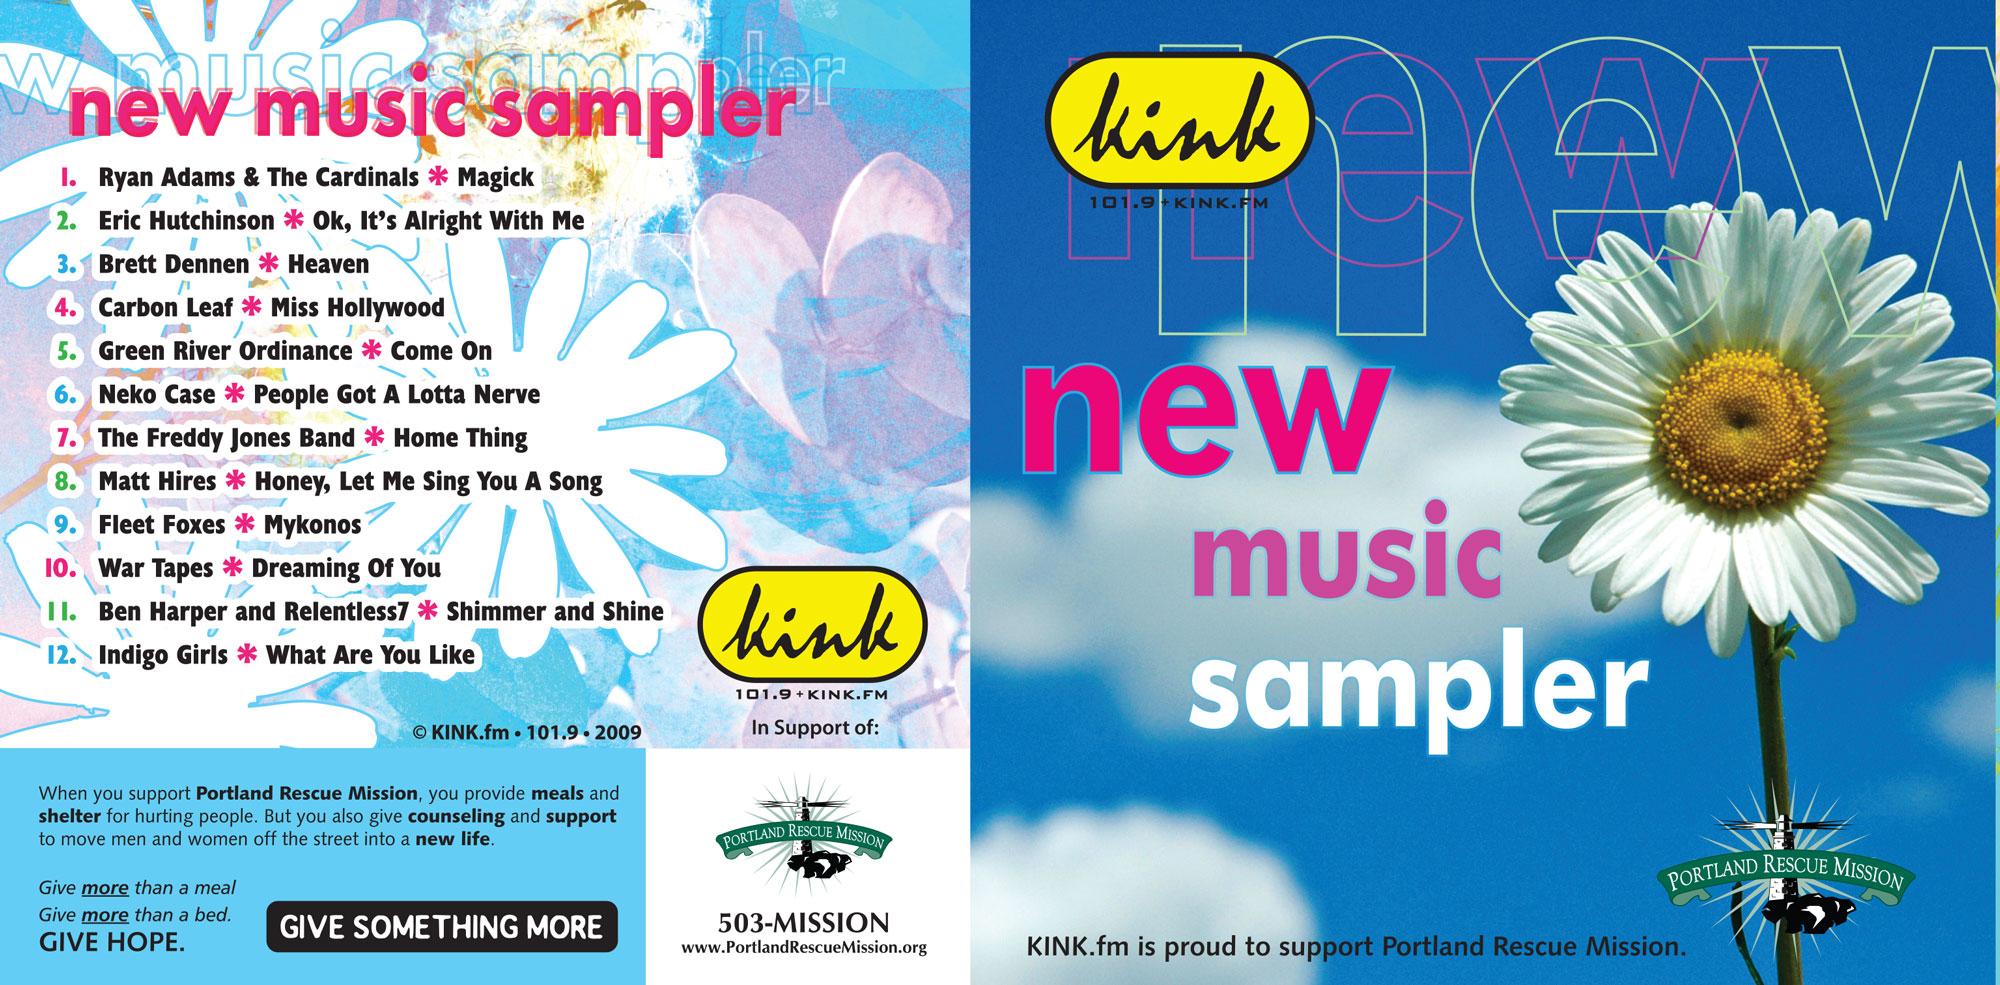 kink.fm road music sponsored by Portland Rescue MIsson